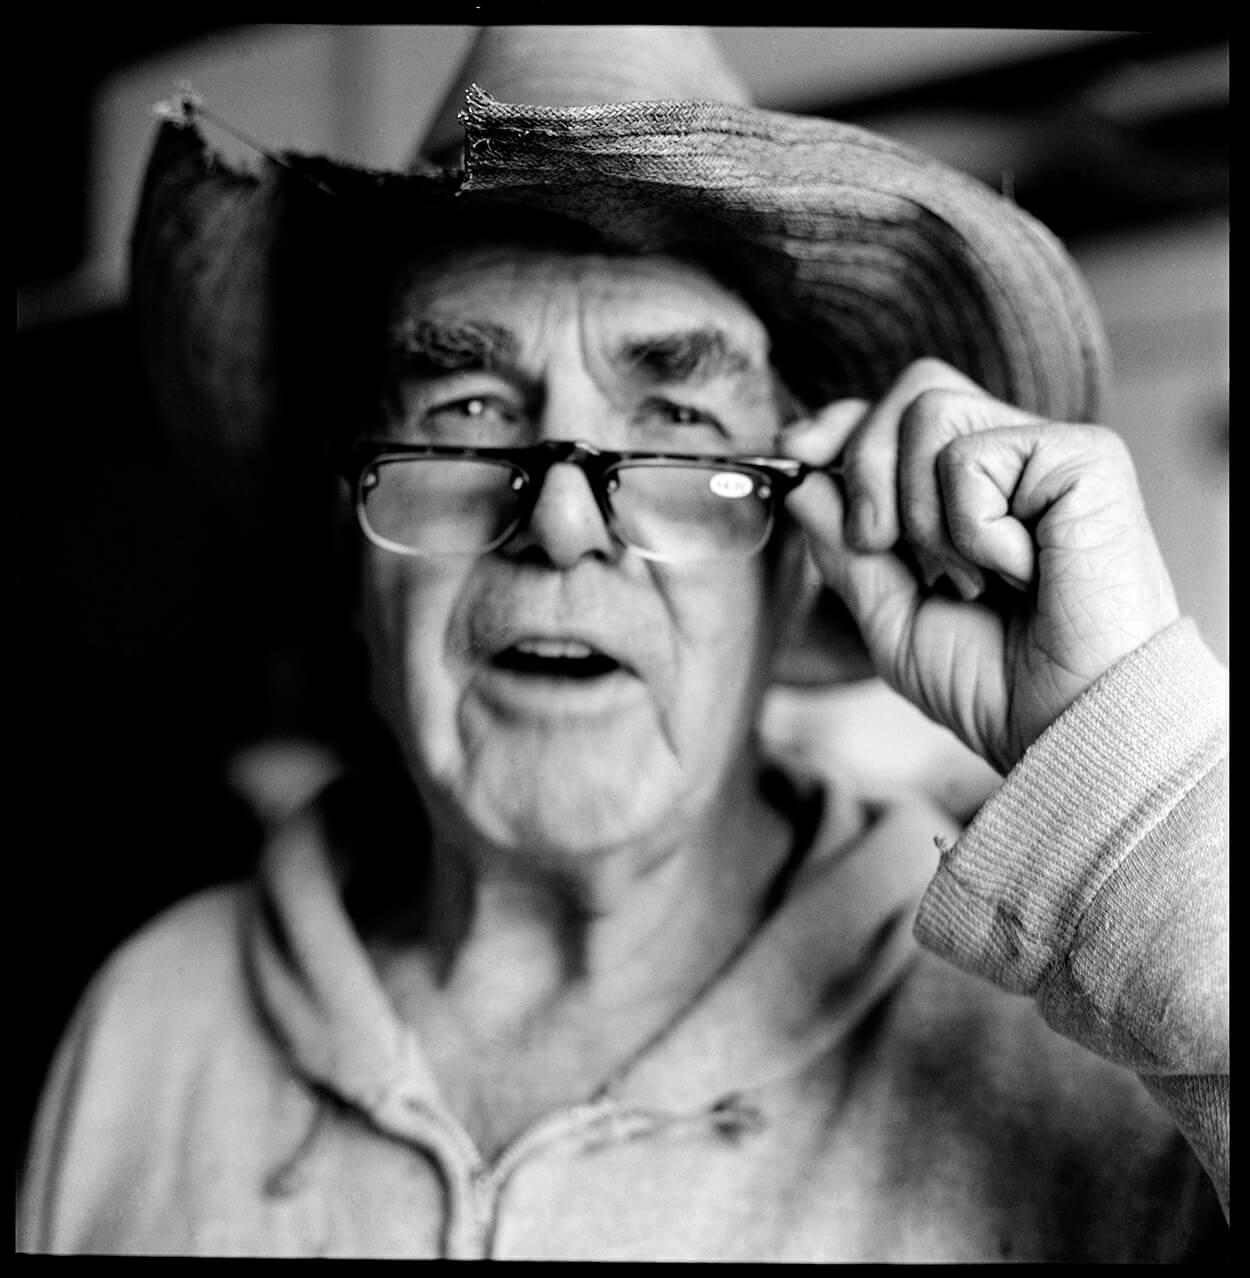 ALVIN - Redneck Roundup - Hunter Barnes Photography